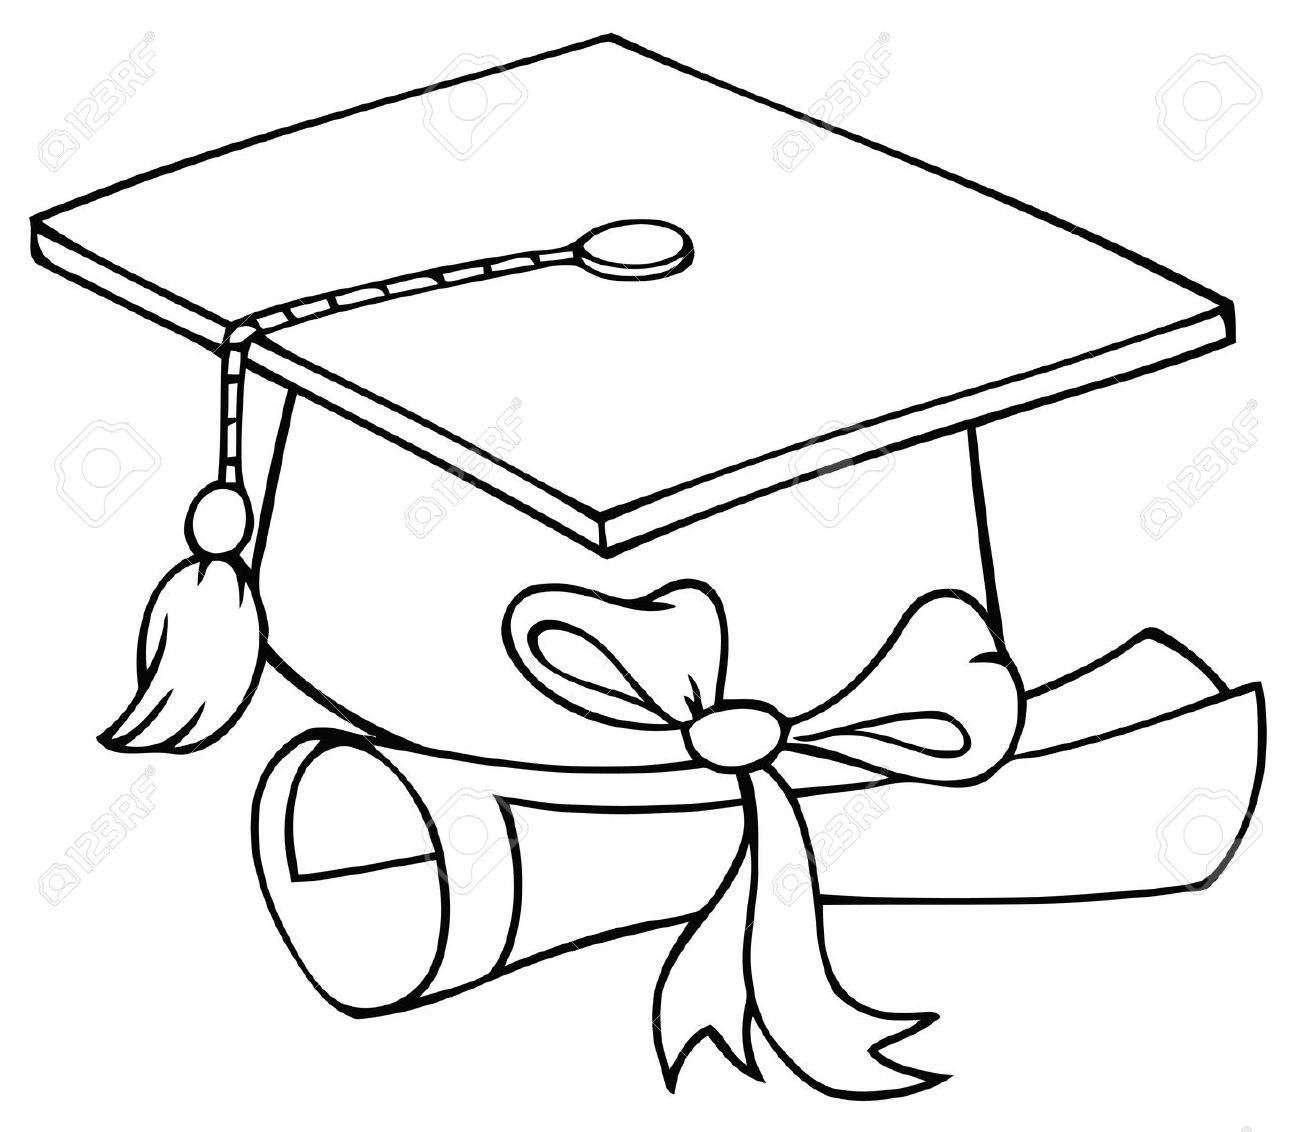 Diploma clipart black and white. Graduation cap clip